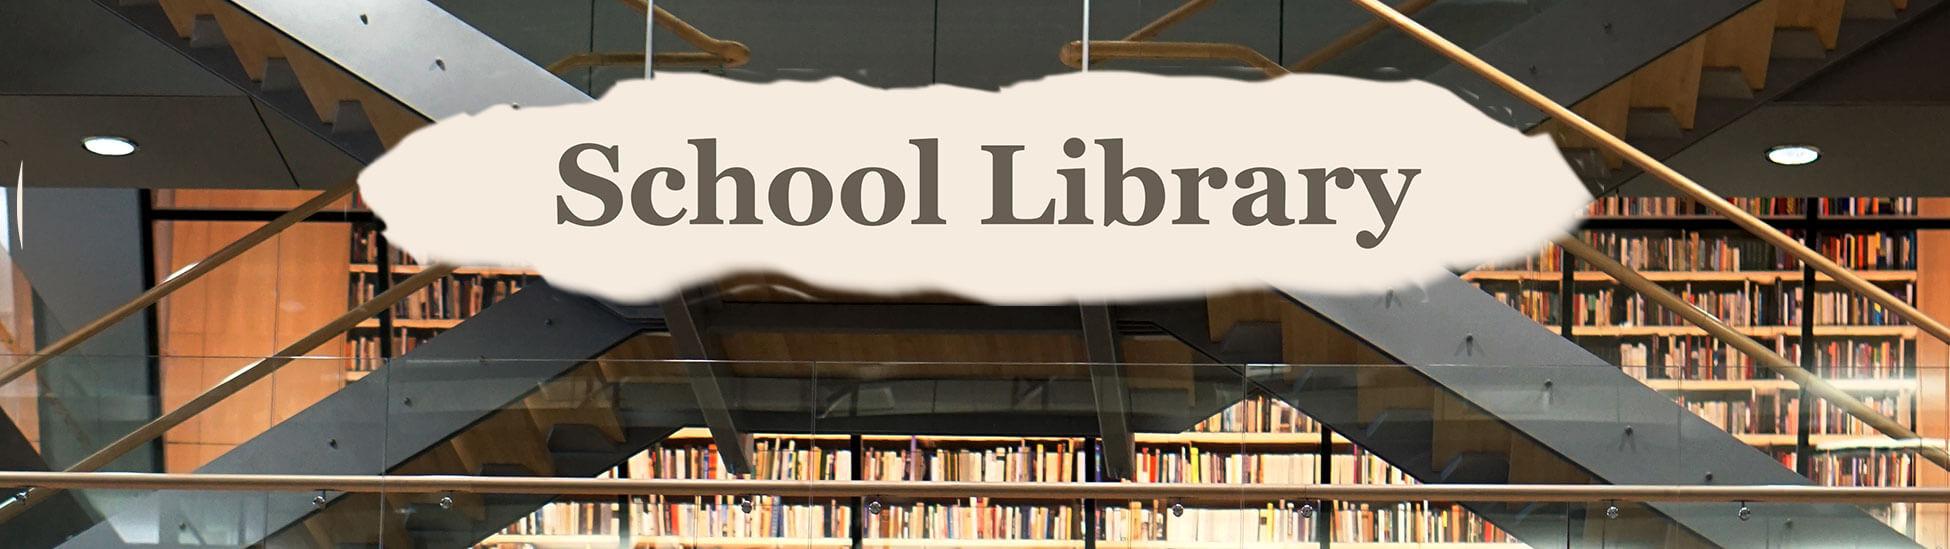 School Library - Chess